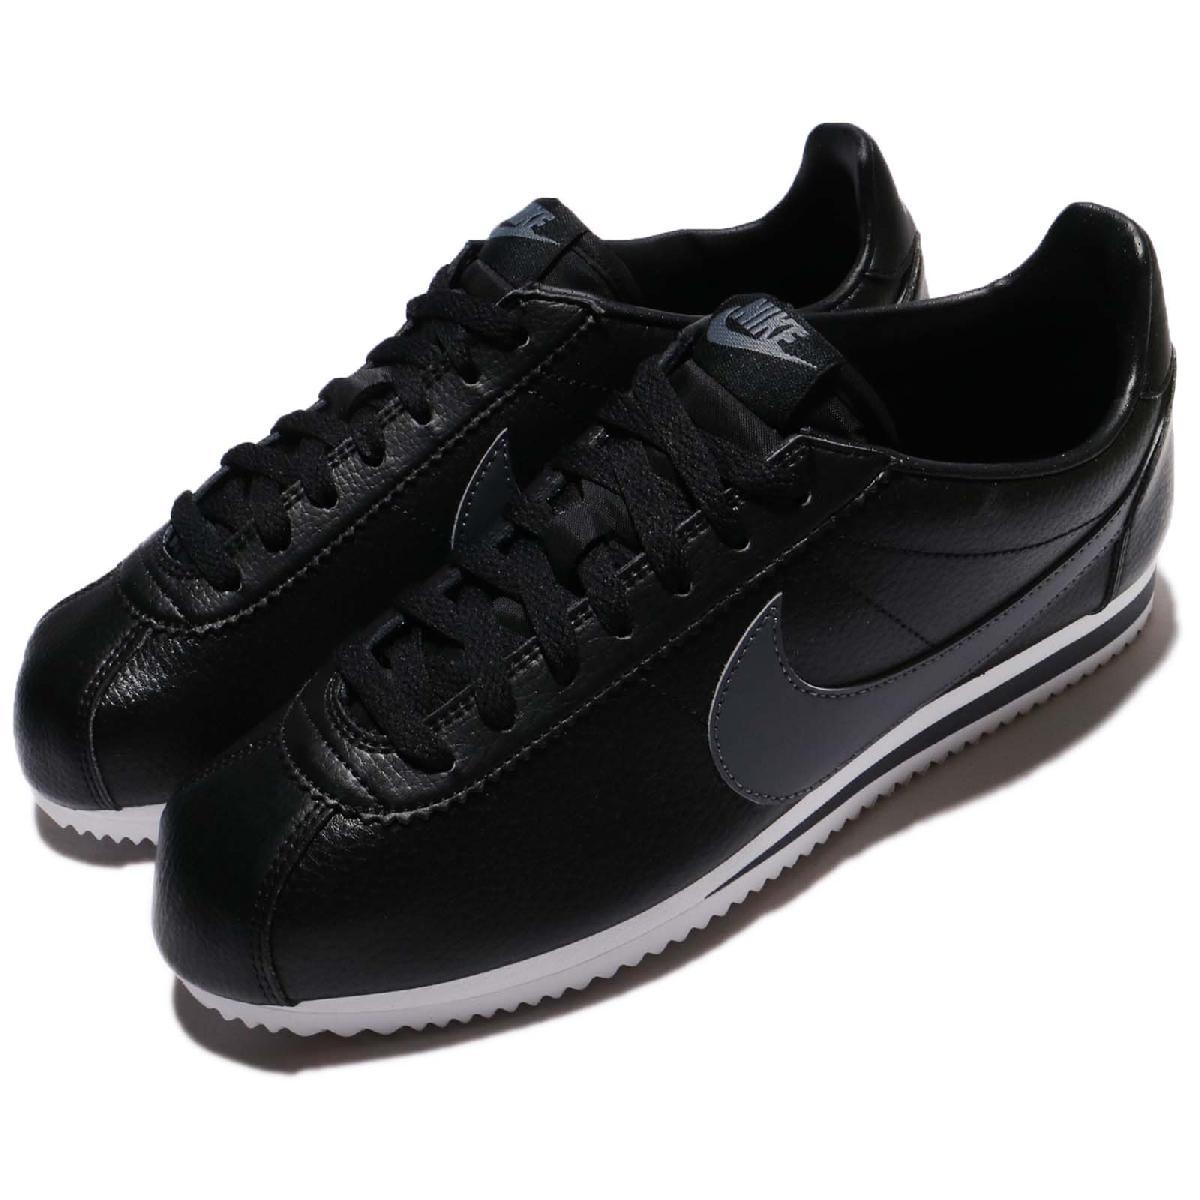 Nike阿甘鞋Classic Cortez Leather黑灰白底皮革男鞋女鞋經典款復古慢跑鞋PUMP306 749571-011